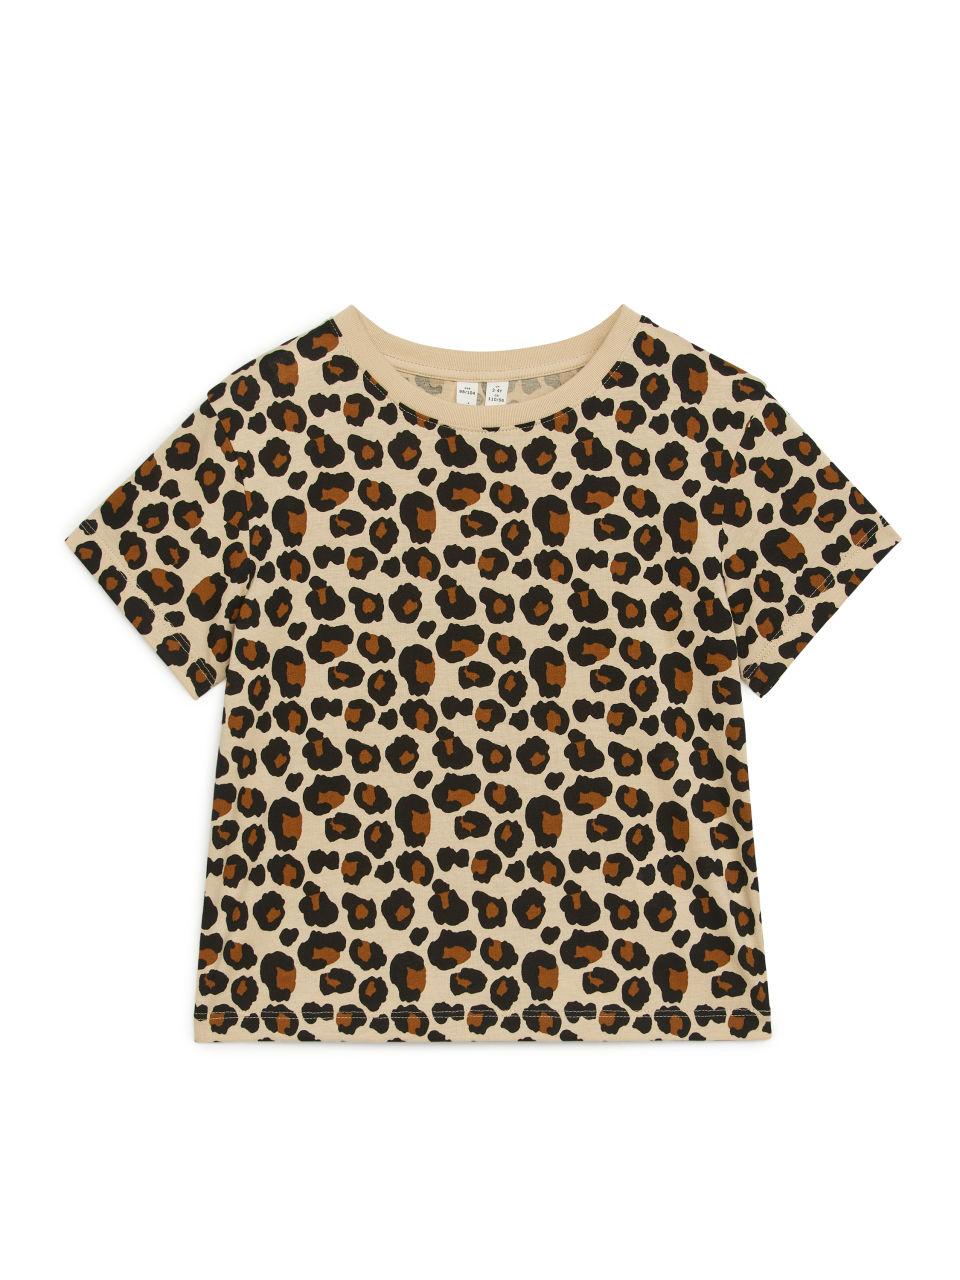 Printed Organic Cotton T-Shirt - Beige